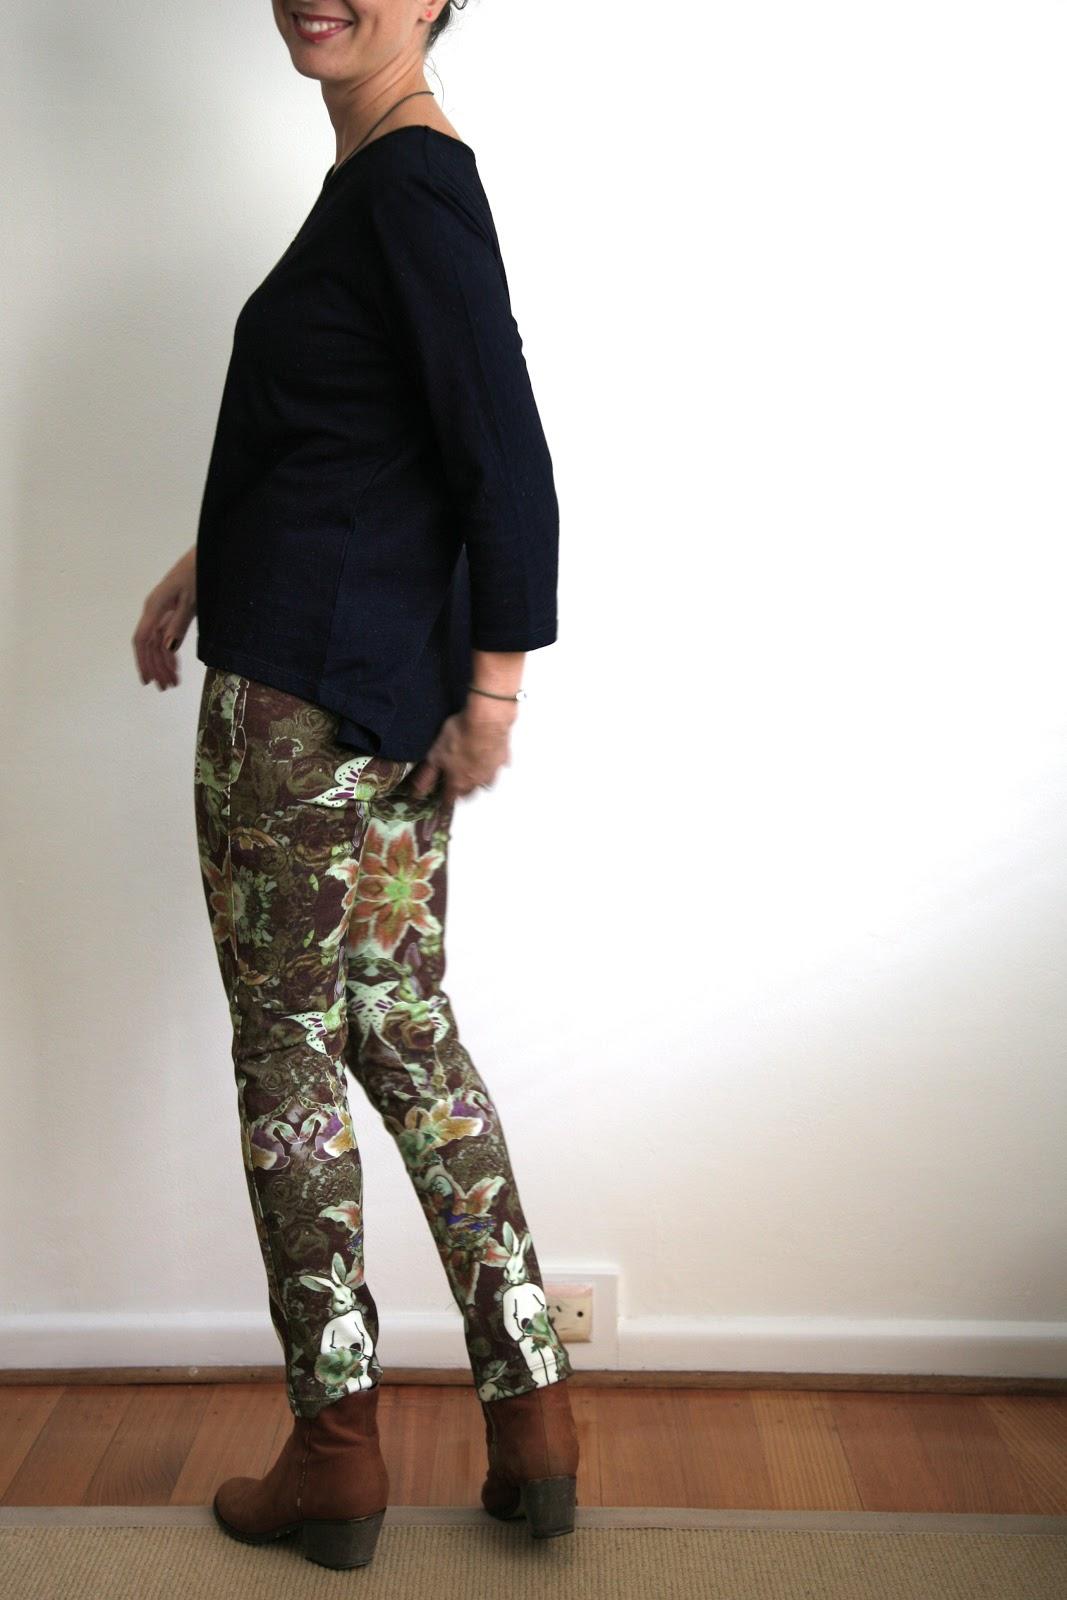 Sew Tessuti Blog - Sewing Tips & Tutorials